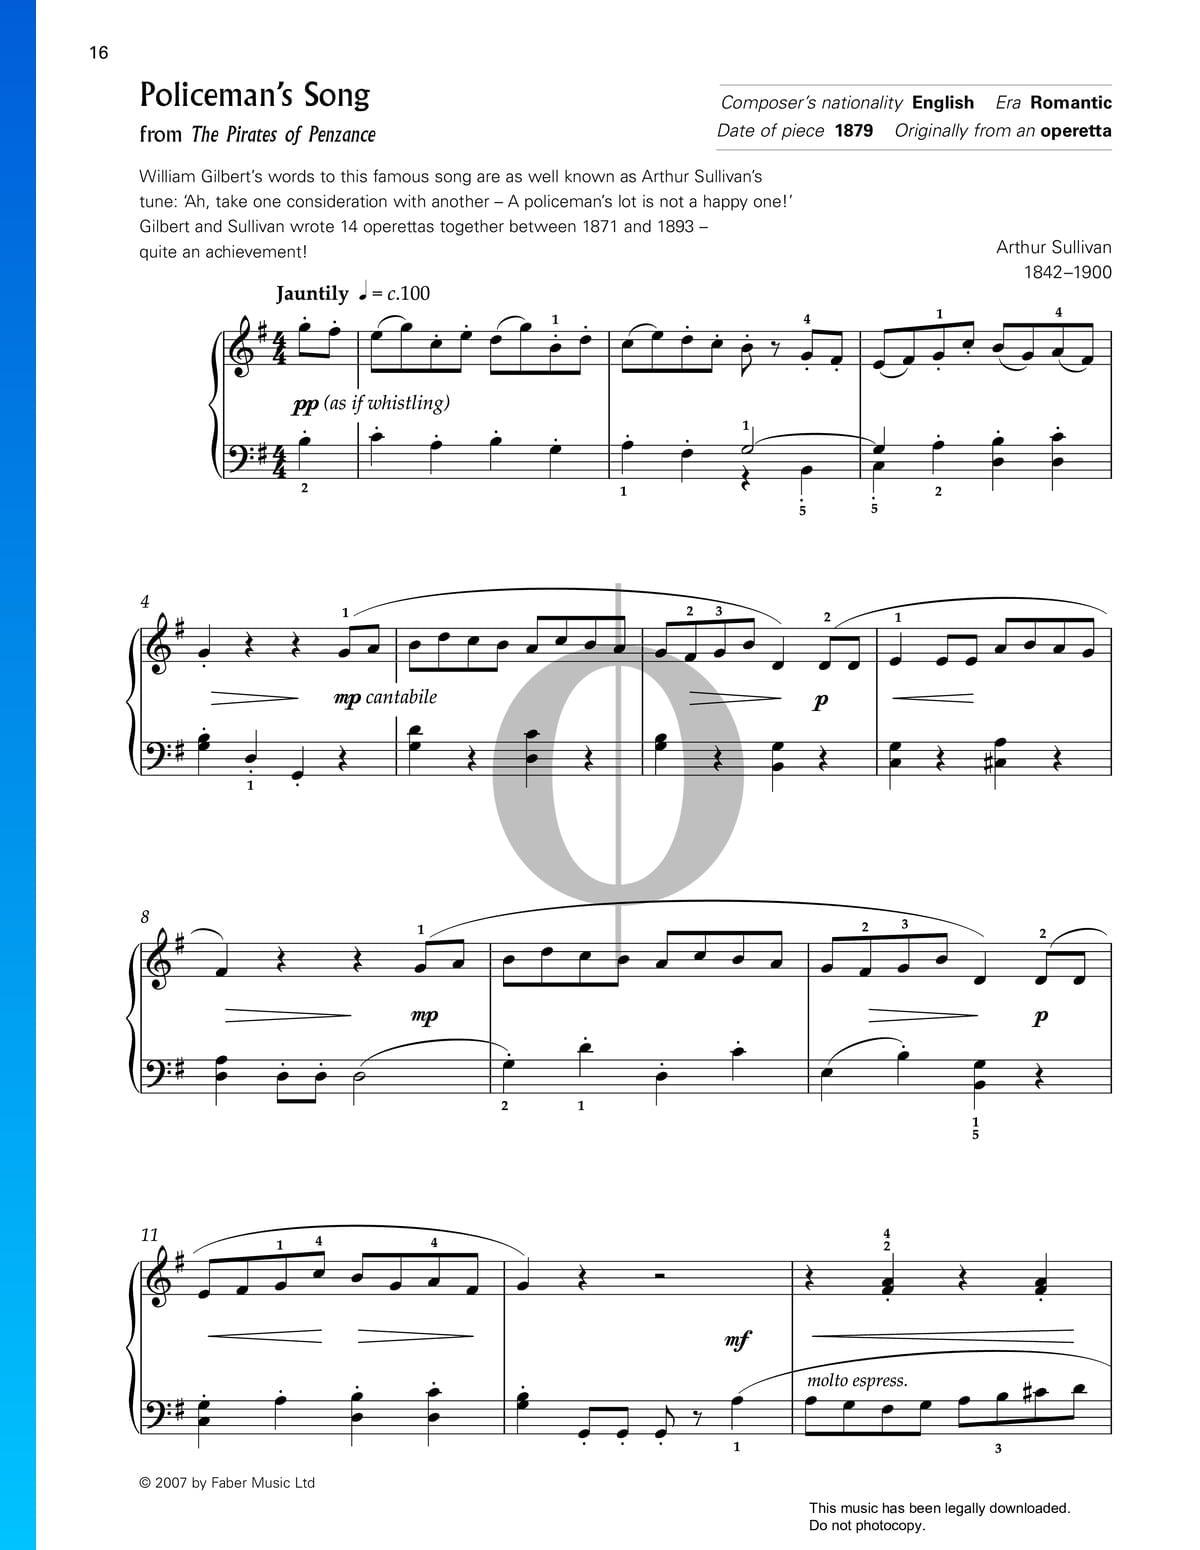 ▷ a policeman's lot is not a happy one sheet music (piano solo) - pdf  download & streaming - oktav  oktav